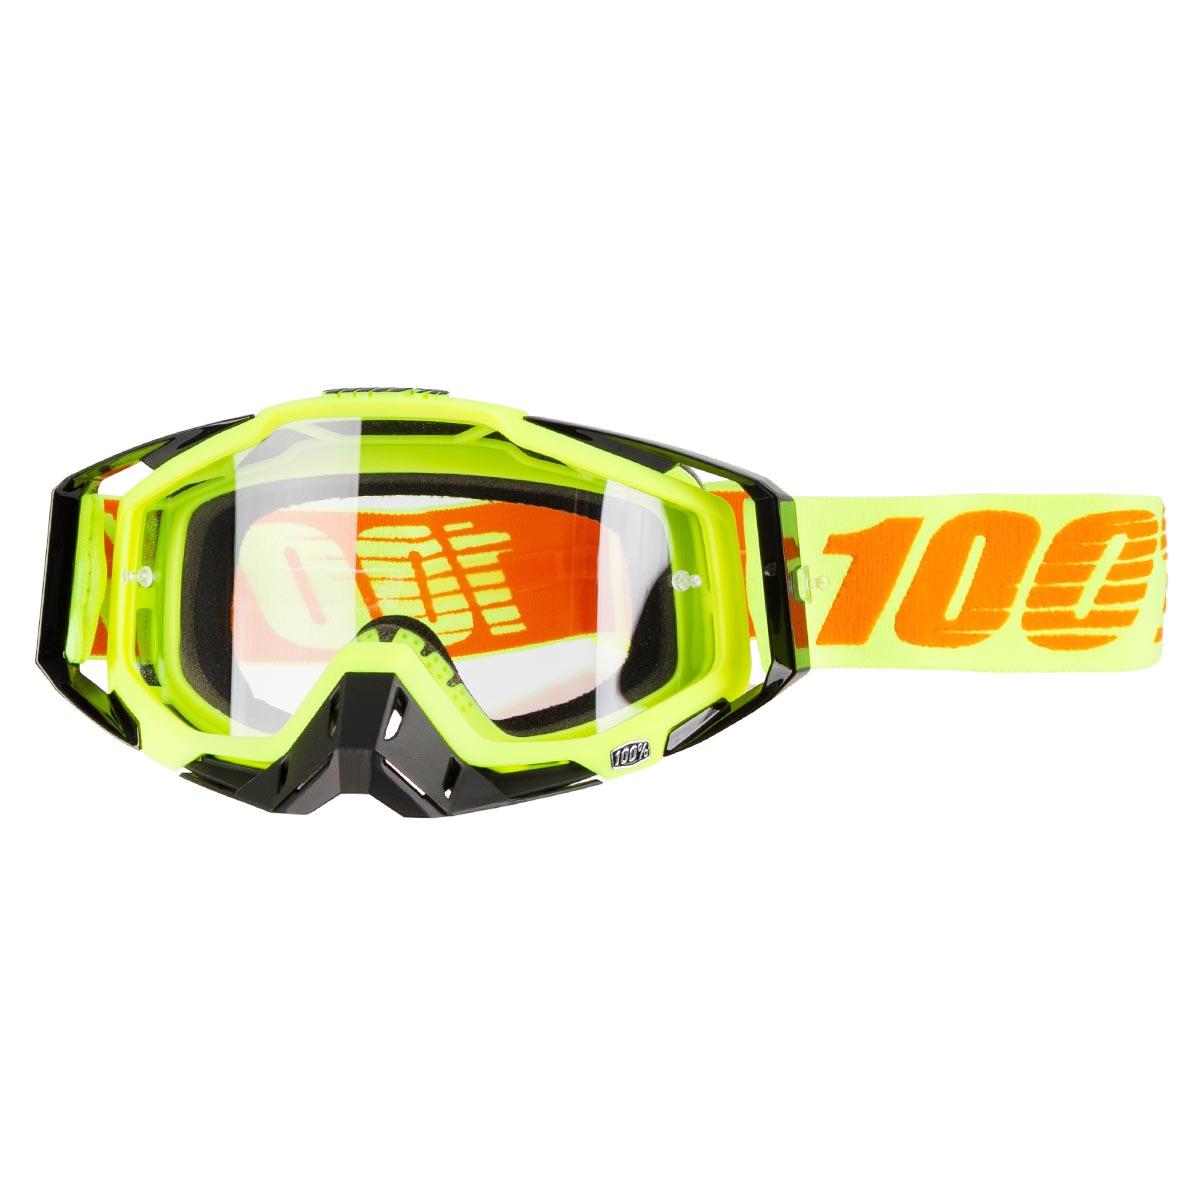 100% Crossbrille The Racecraft Attack Yellow - Klar Anti-Fog